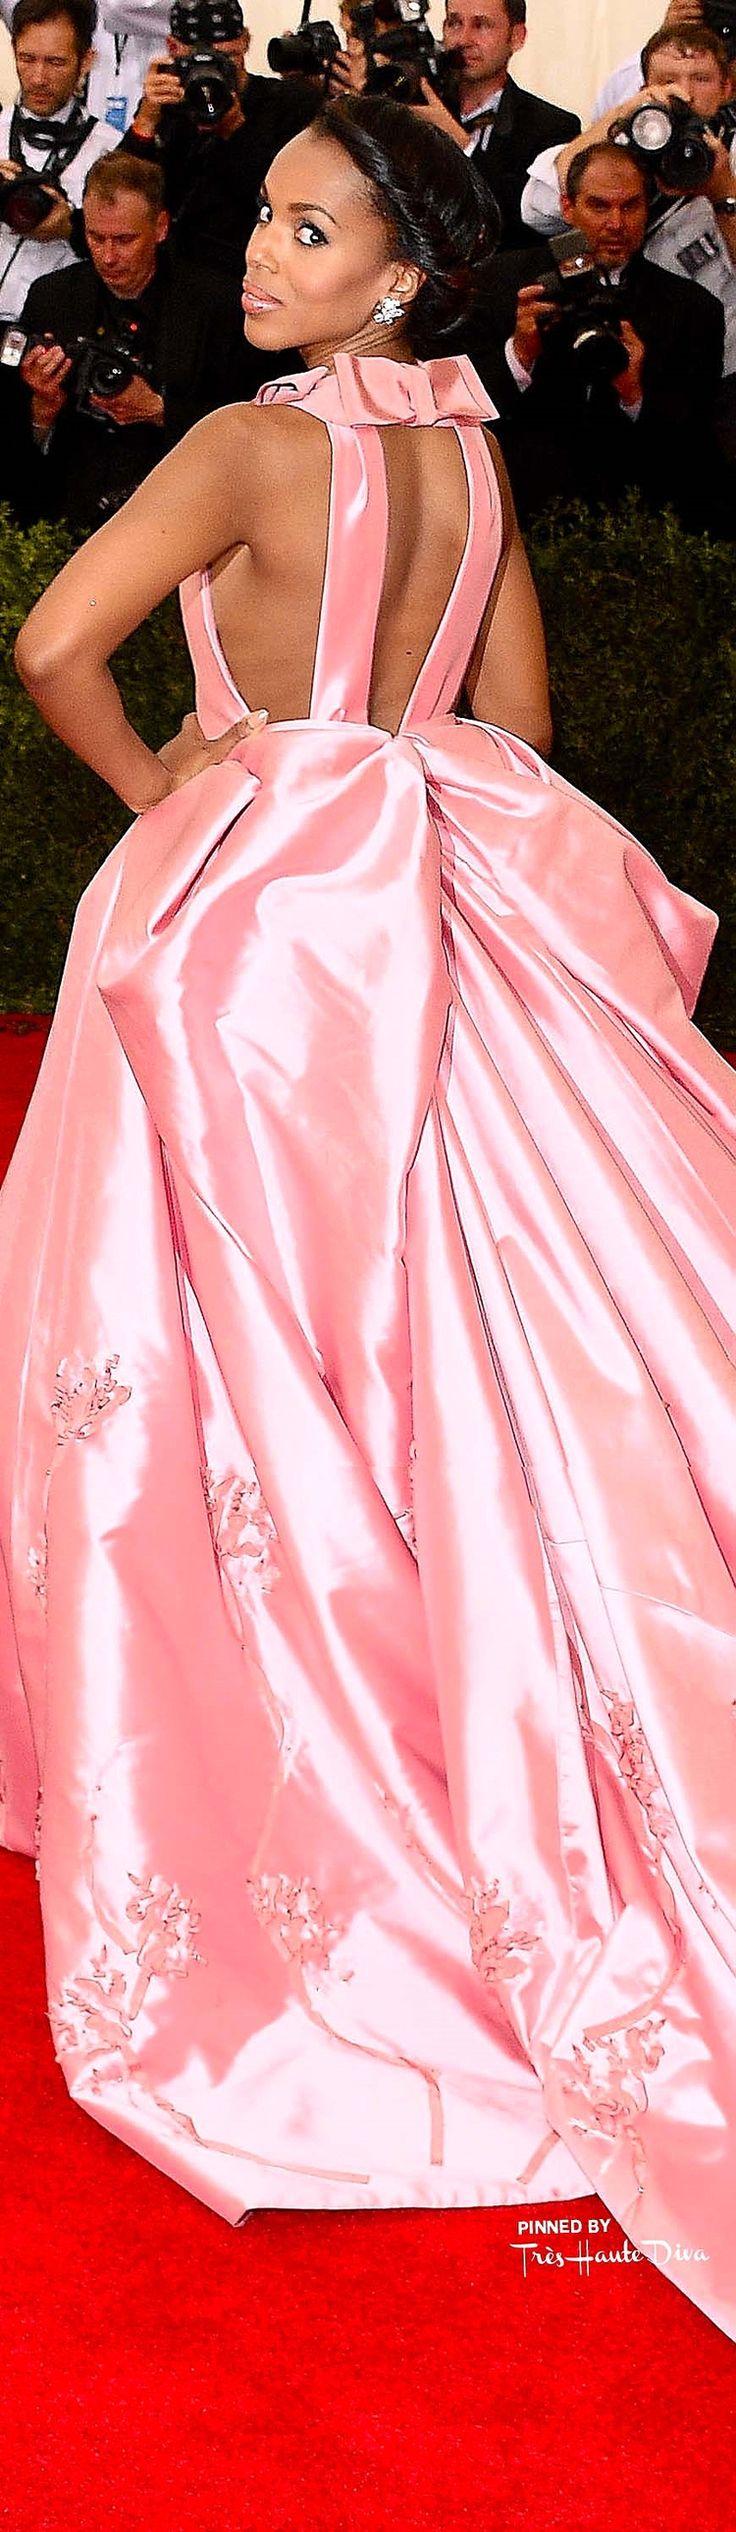 Kerry Washington in Prada  ♔ Très Haute Diva ♔